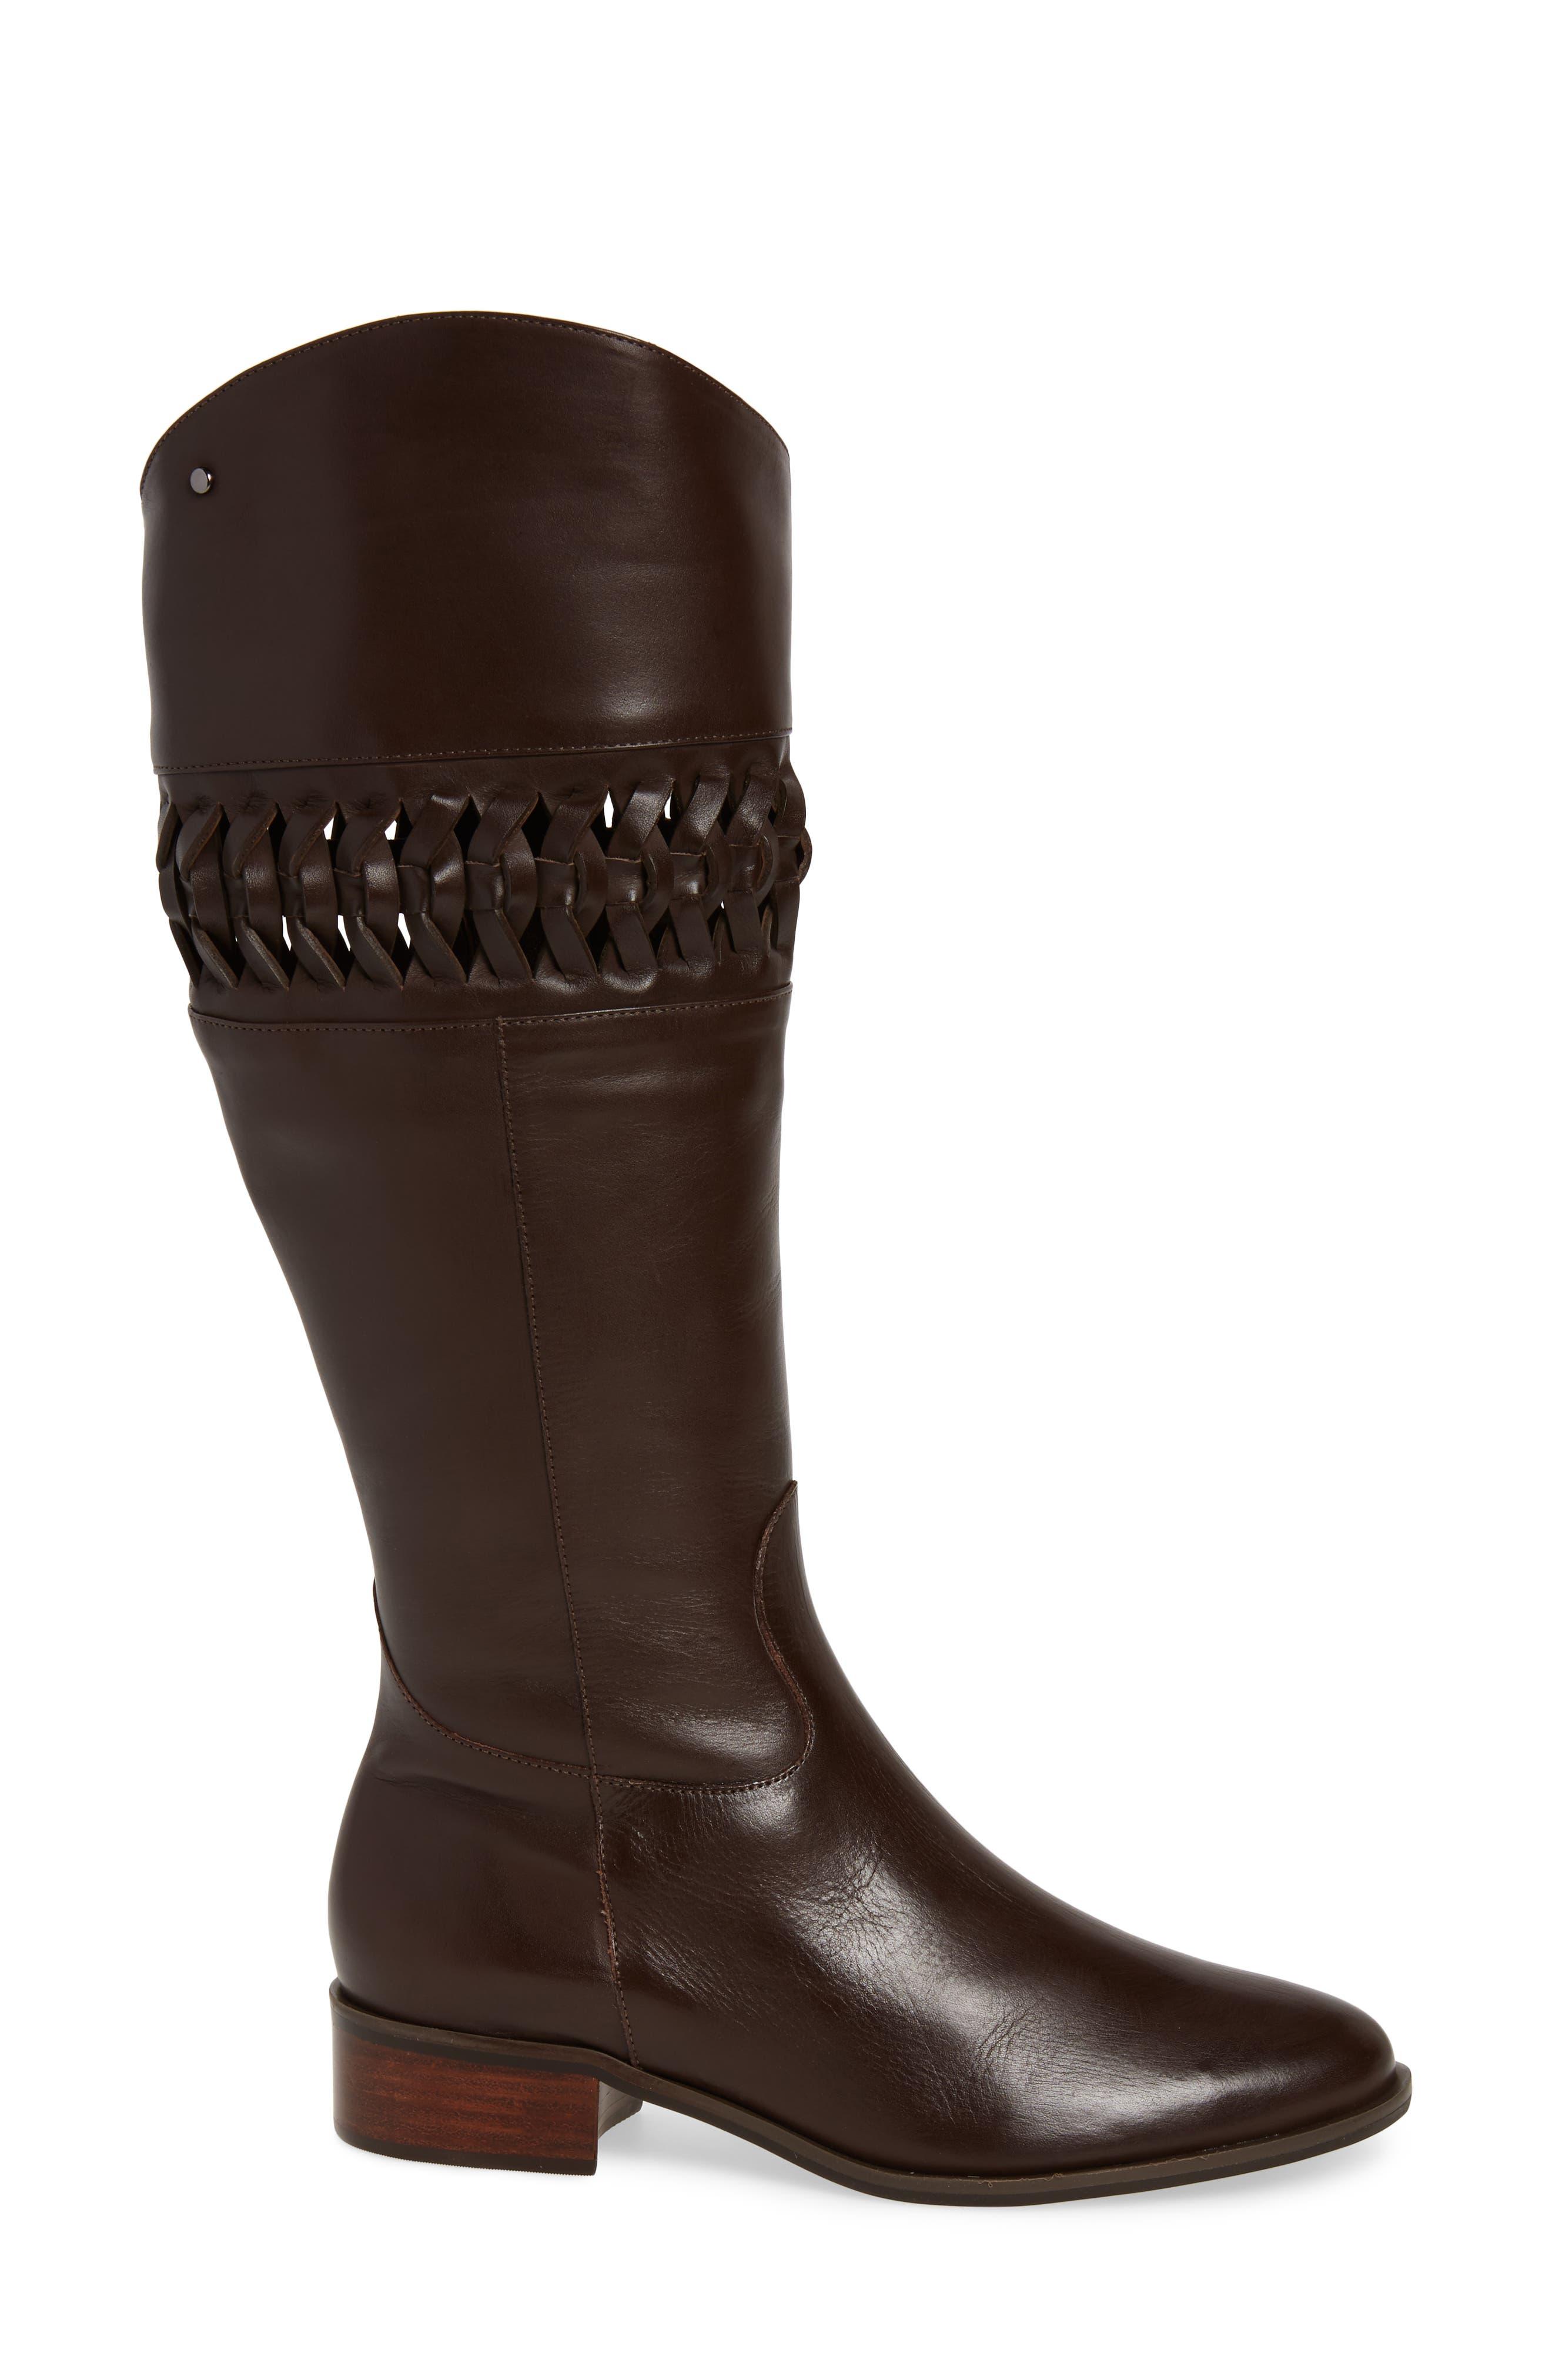 Zezette Woven Boot,                             Alternate thumbnail 3, color,                             Cafe Leather